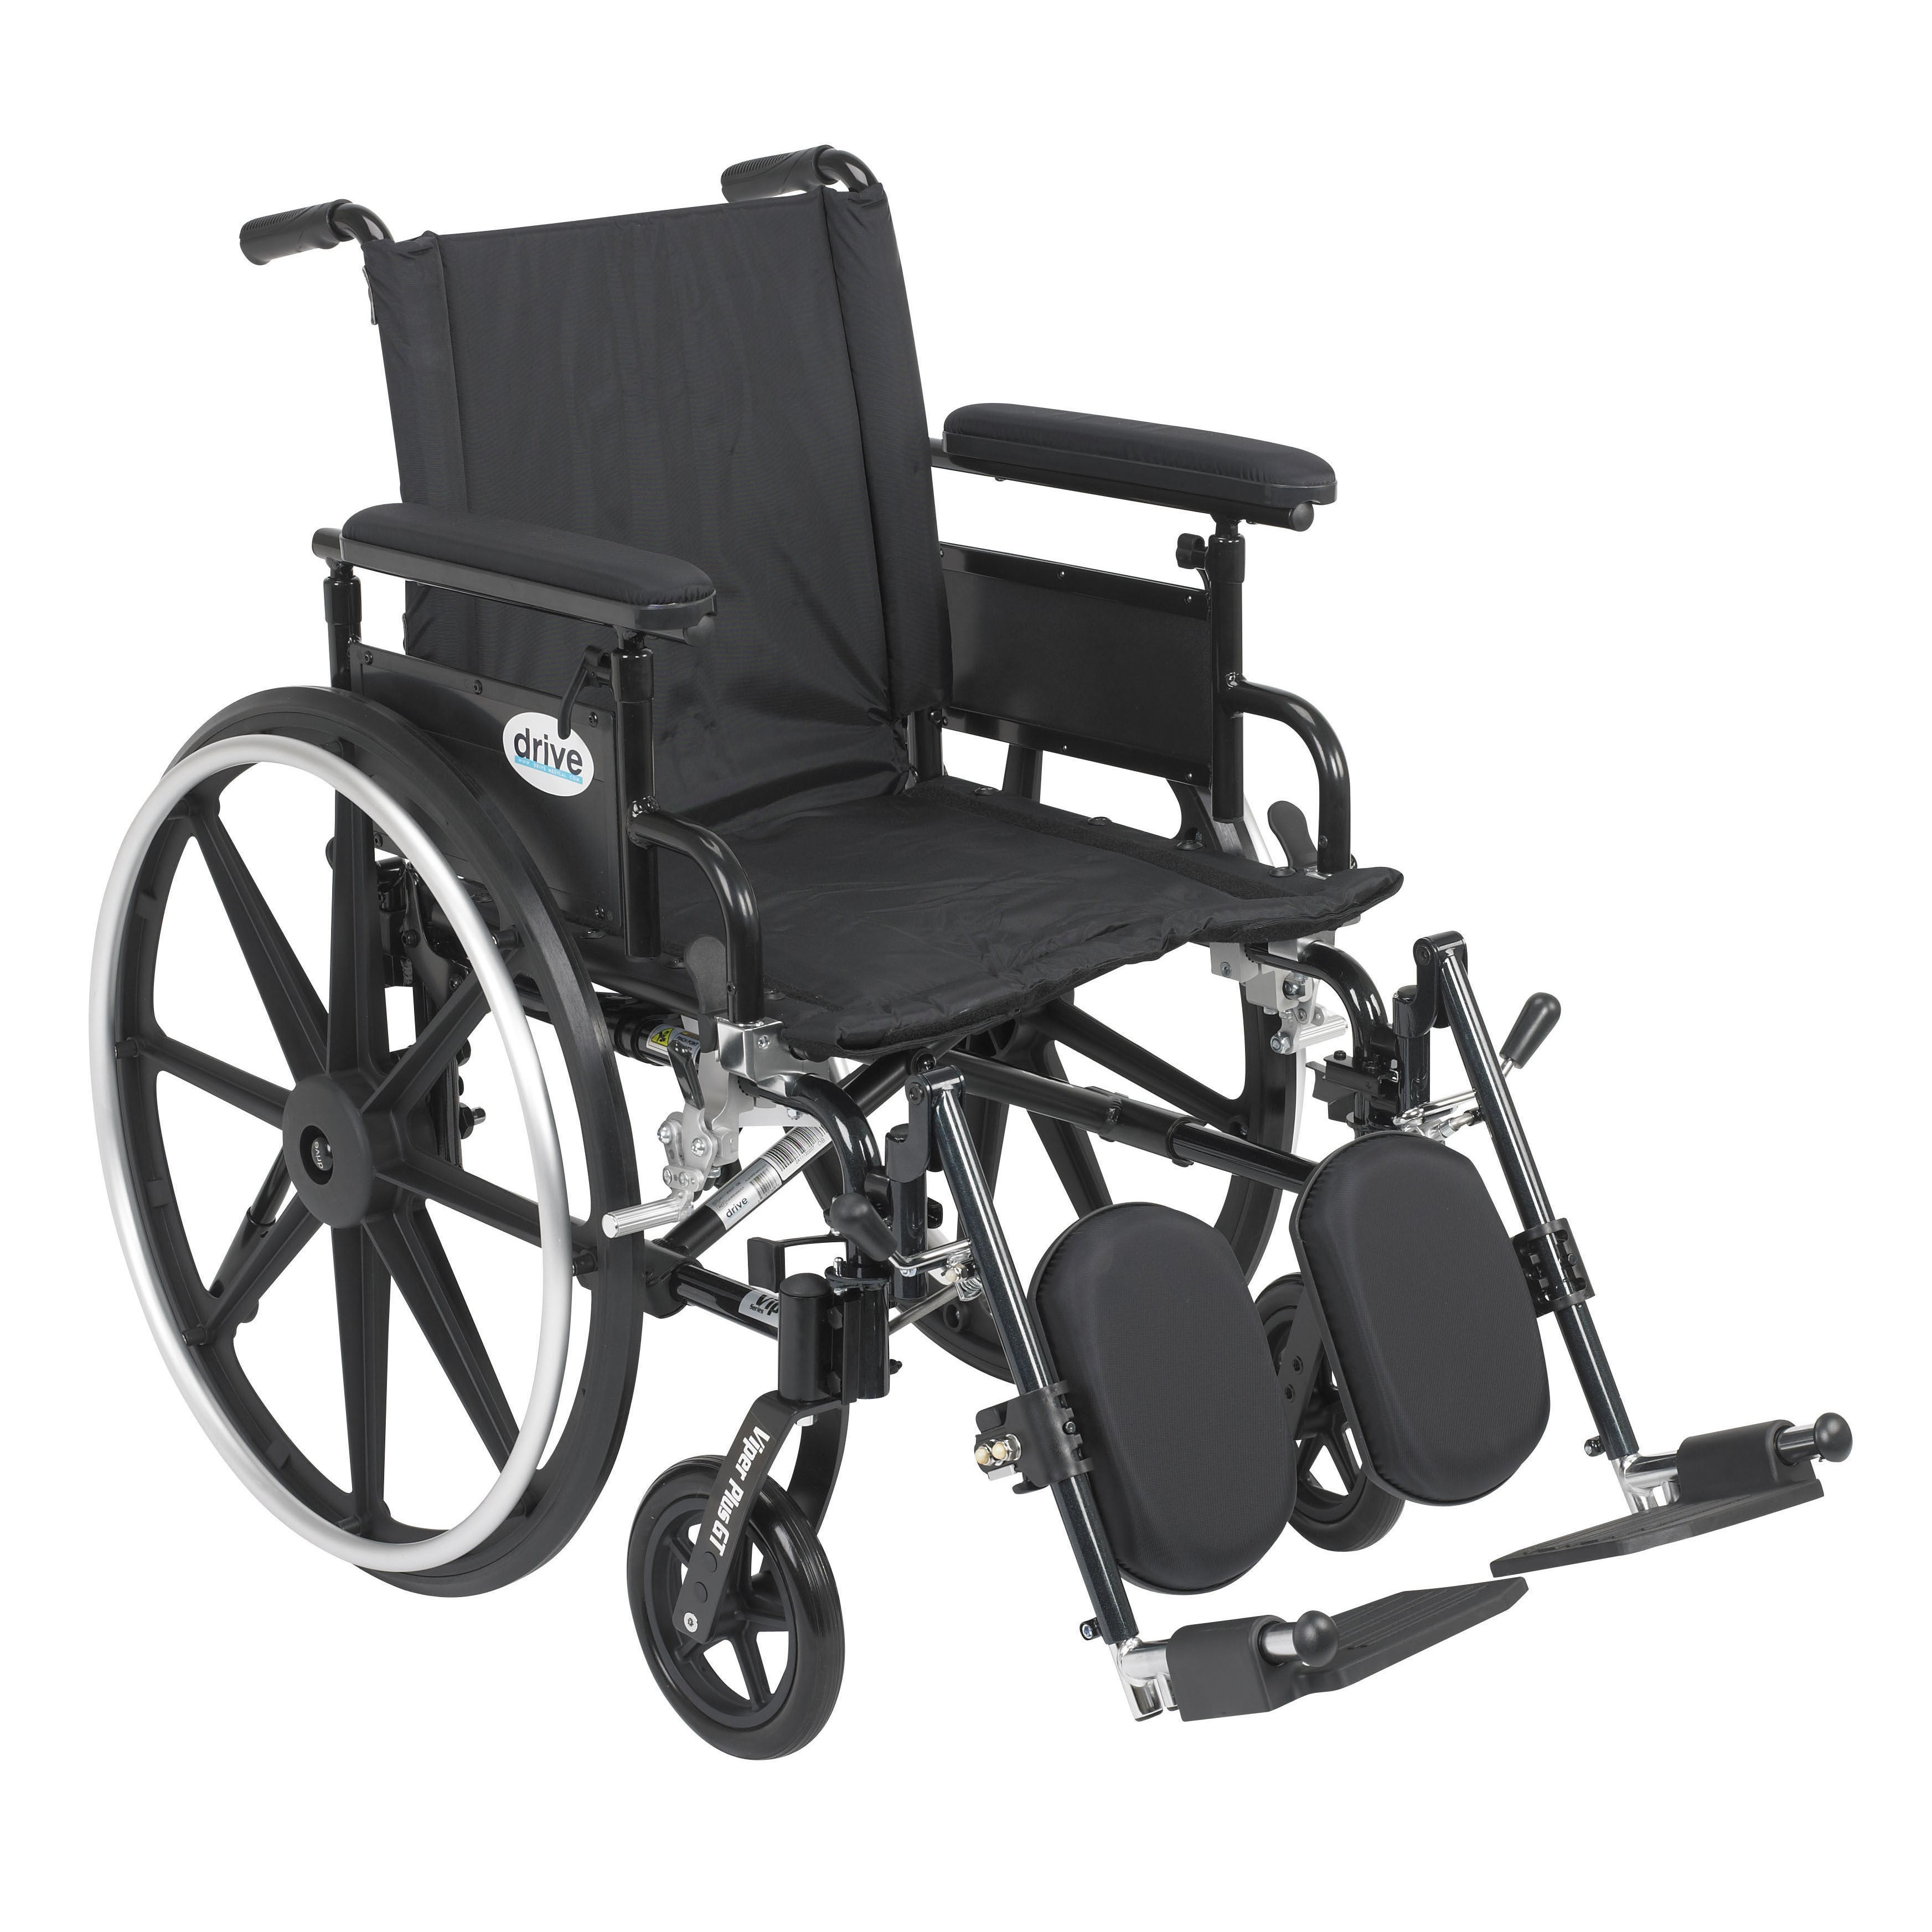 Drive Medical Viper Plus GT Wheelchair with Flip Back Adj...